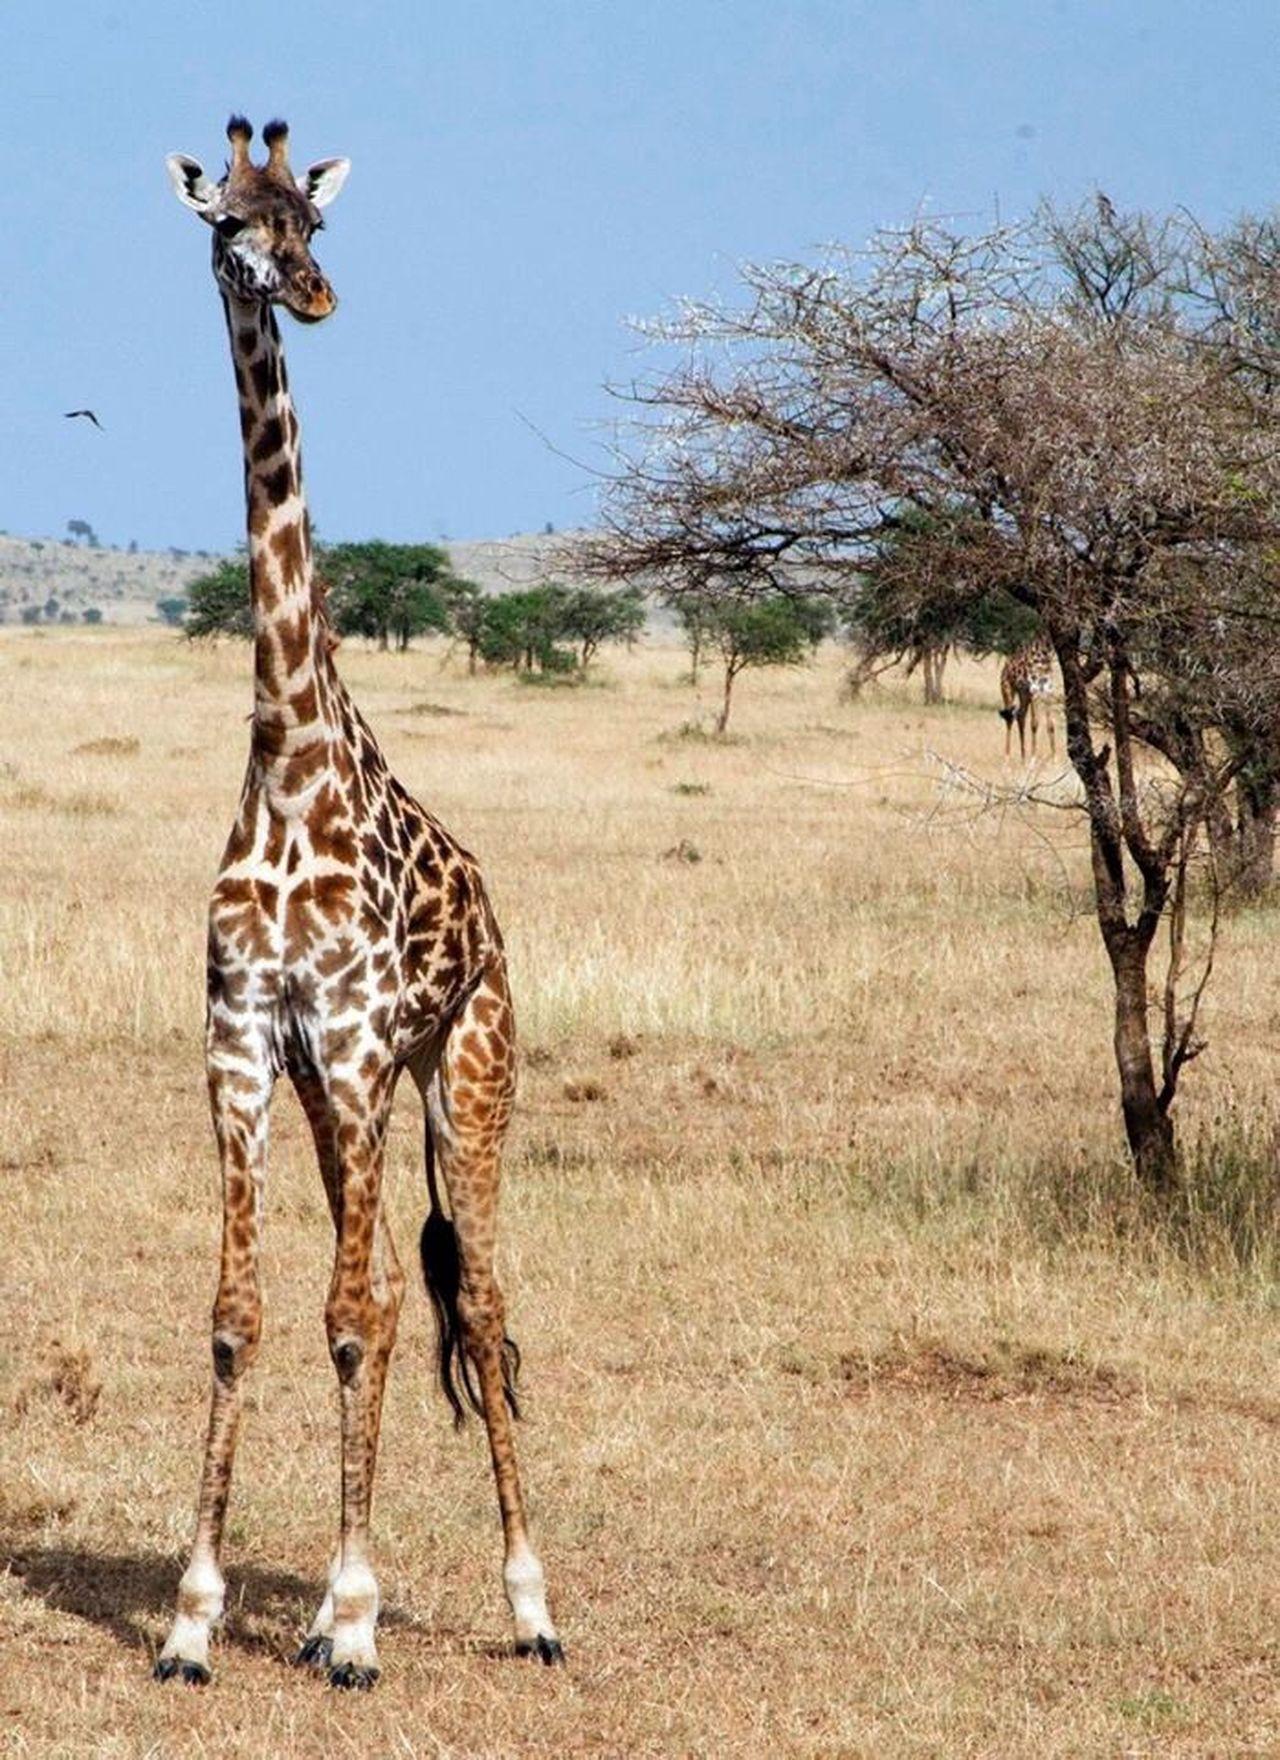 Giraffe Animal Wildlife Serengeti National Park Tansania Africa